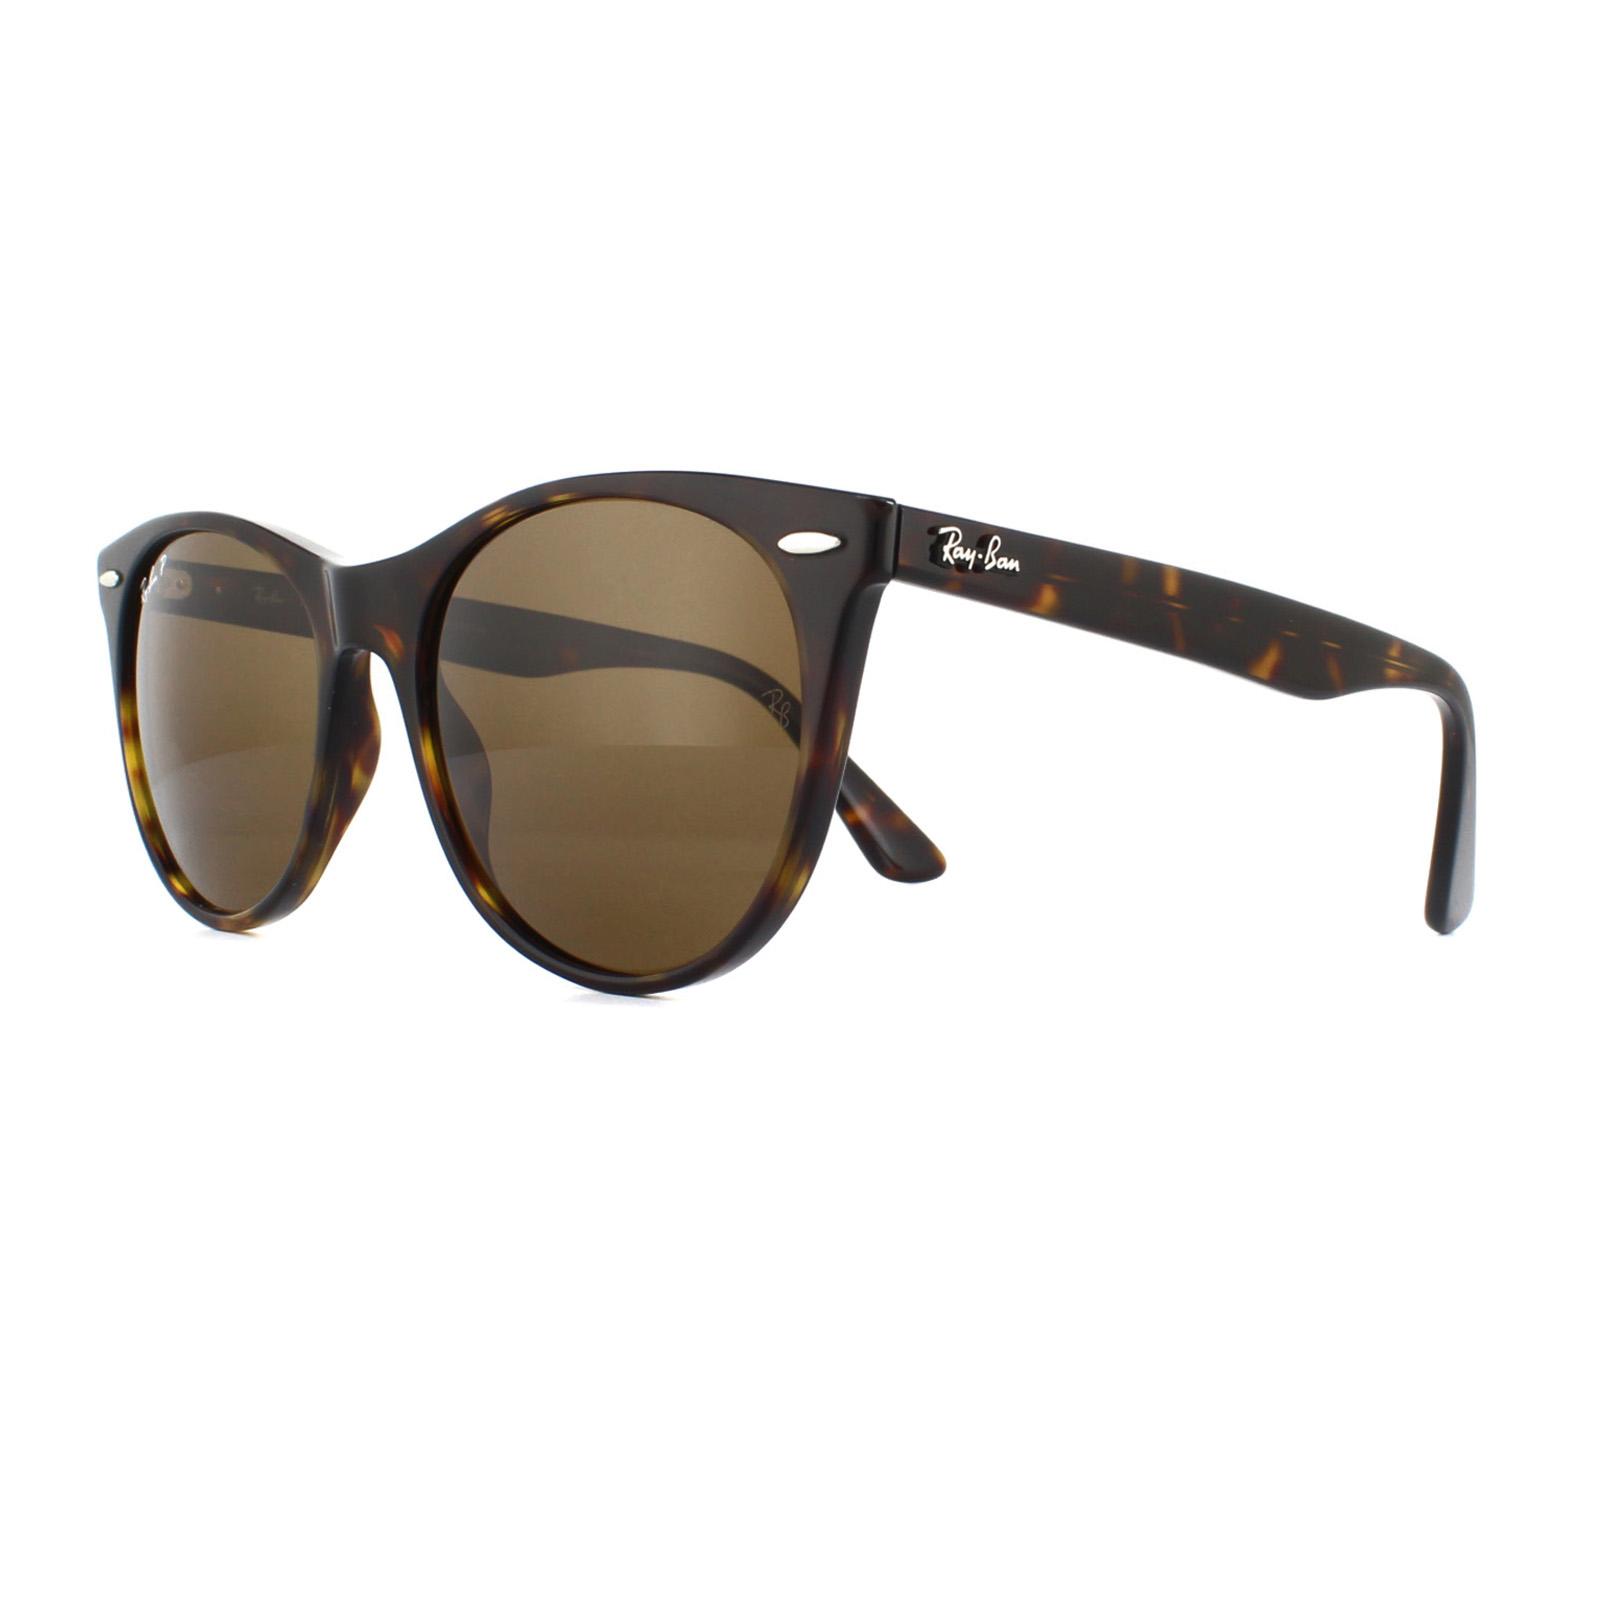 9cbcb475b Cheap Ray-Ban Wayfarer II RB2185 Sunglasses - Discounted Sunglasses